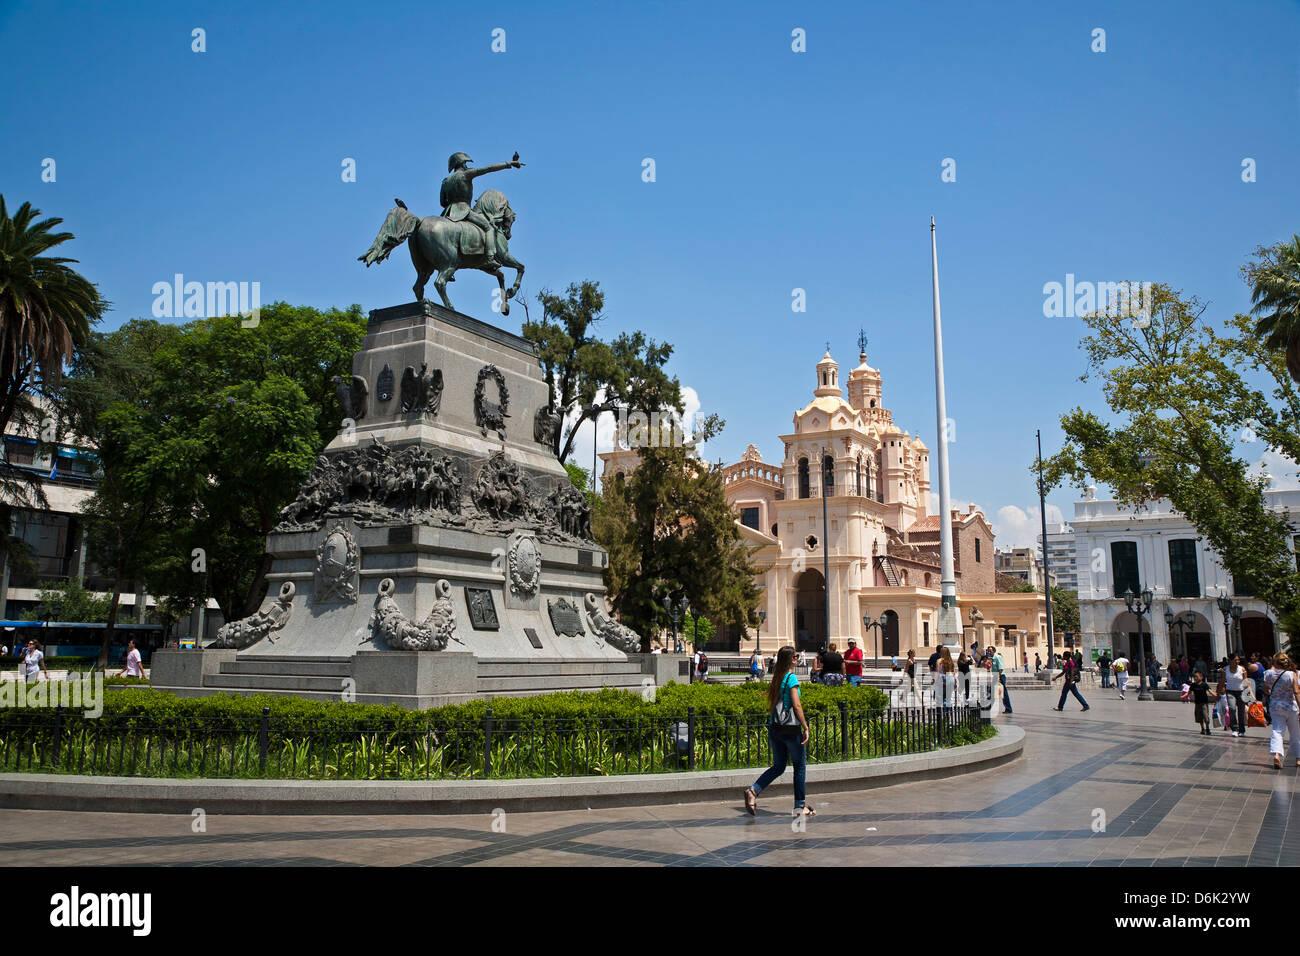 Plaza San Martin, Cordoba City, Cordoba Province, Argentina, South America, South America Stock Photo